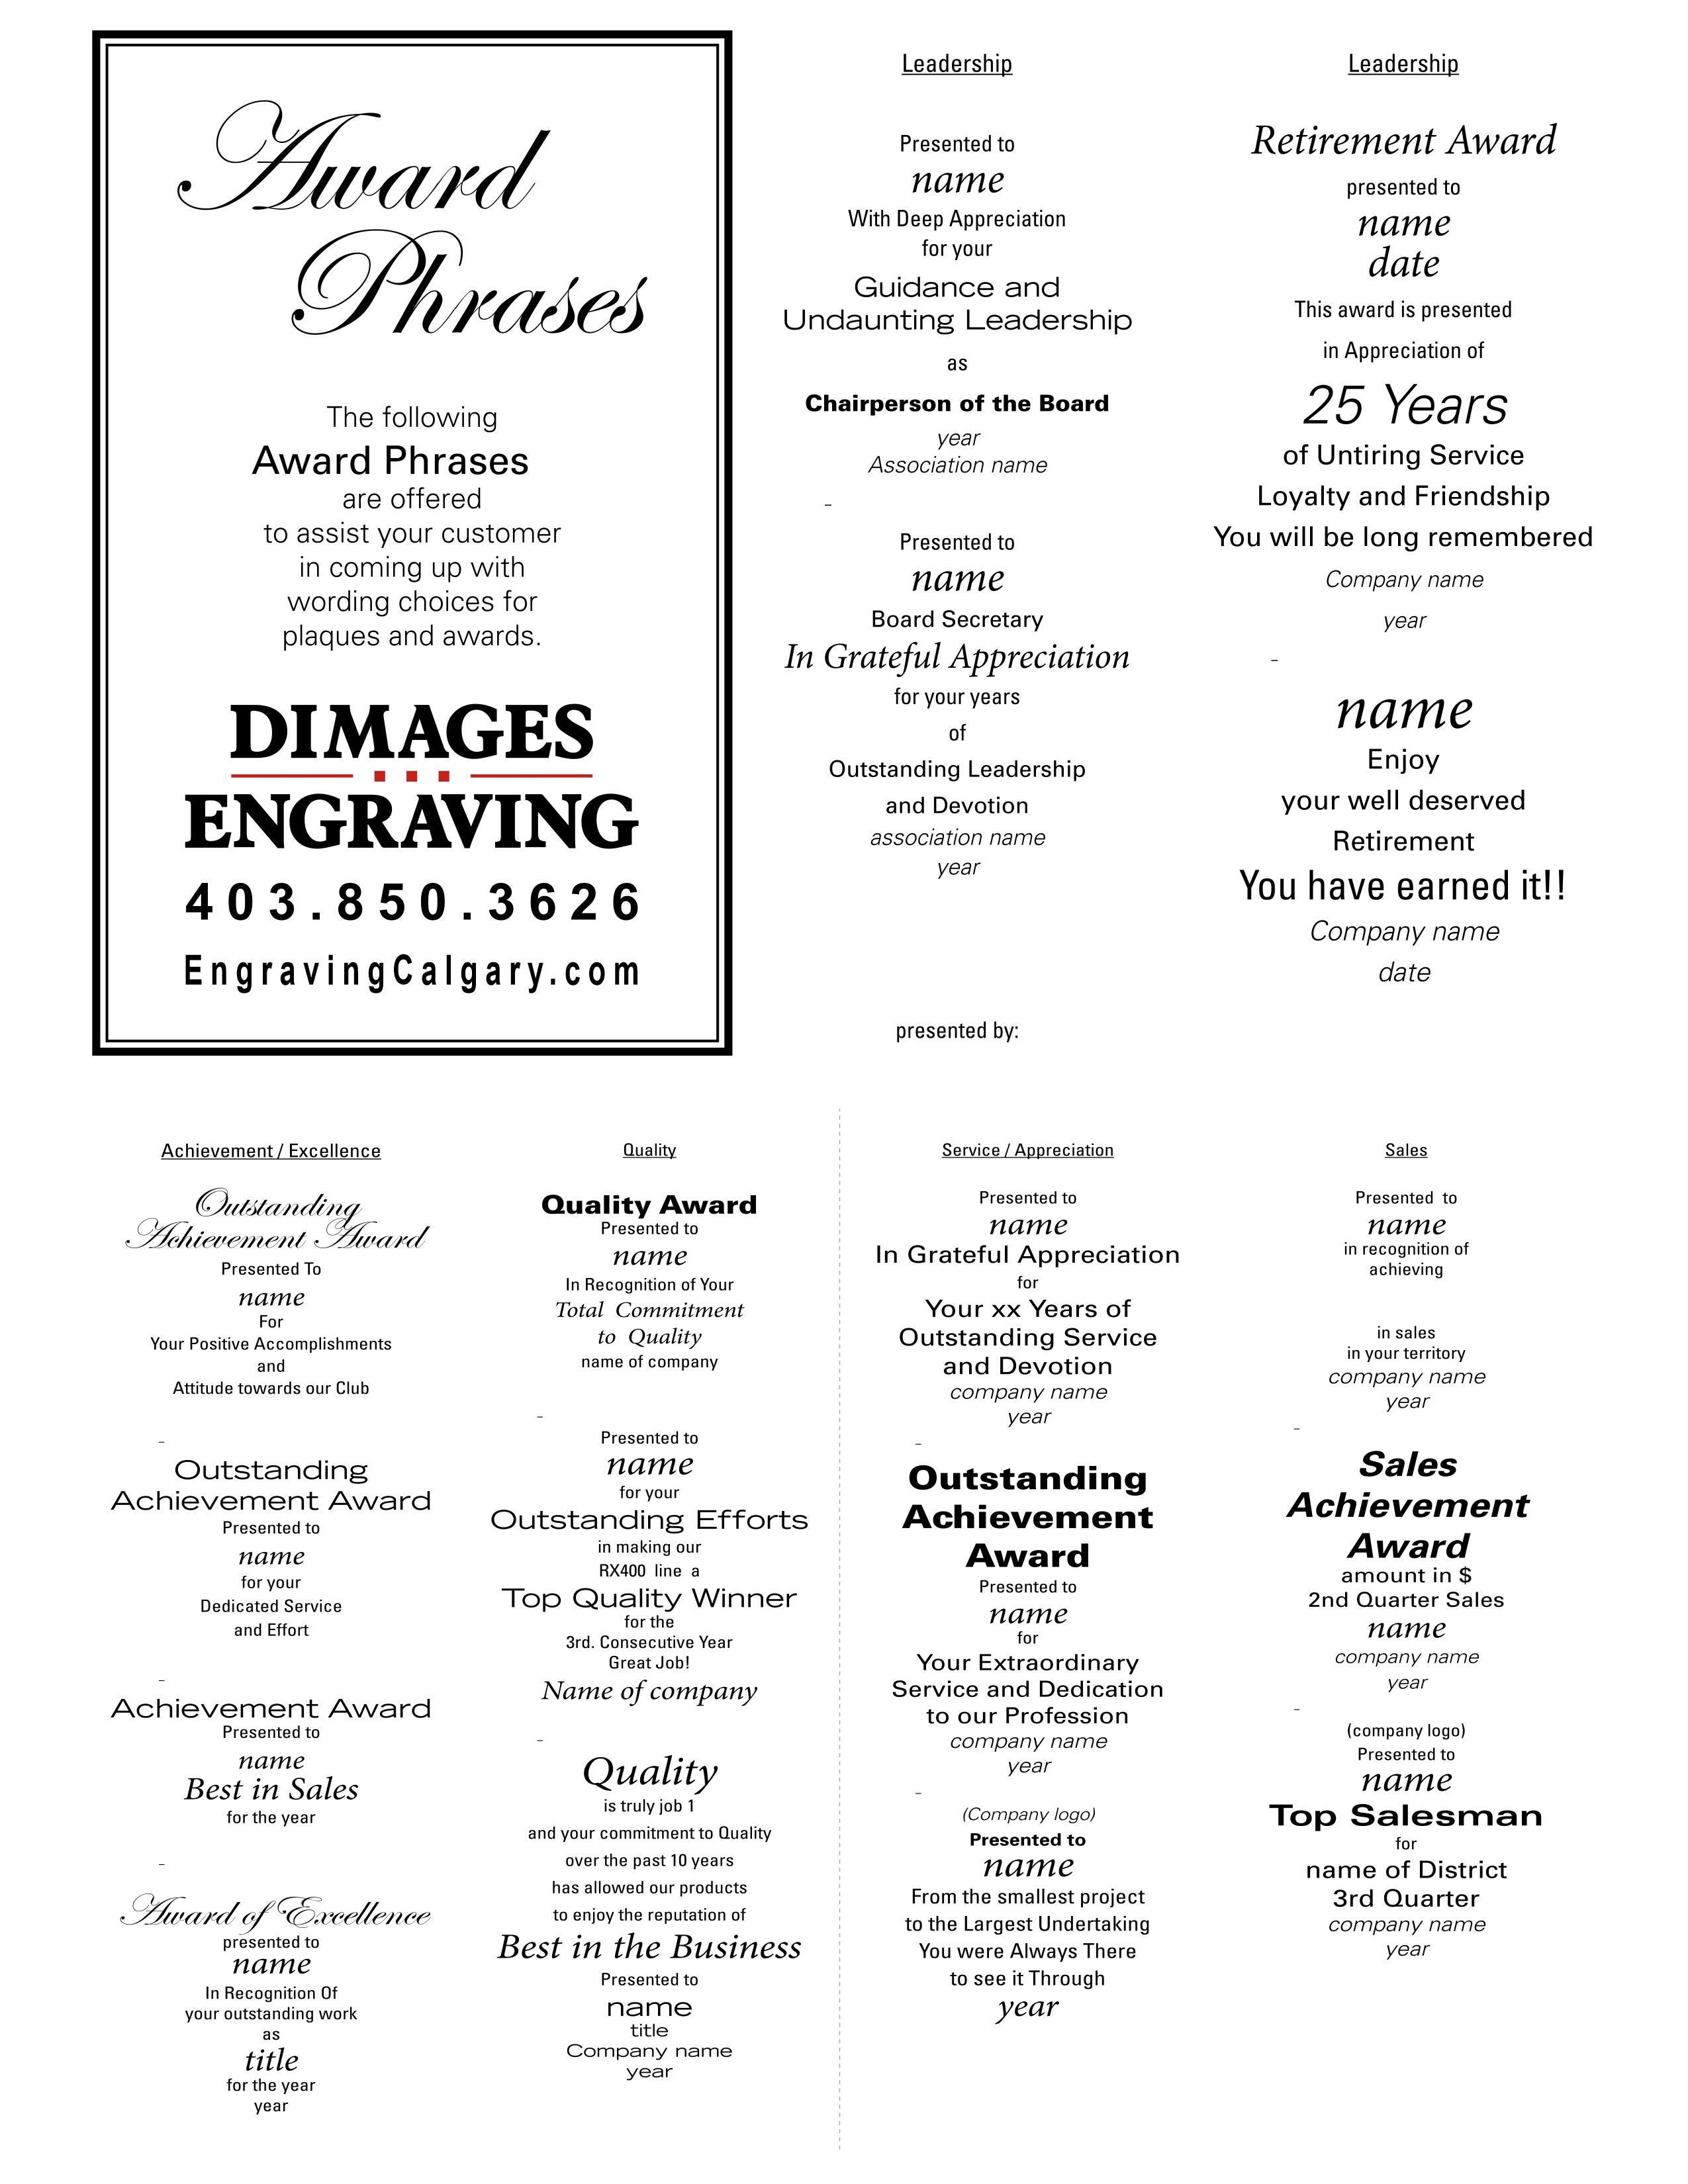 Award Phrases